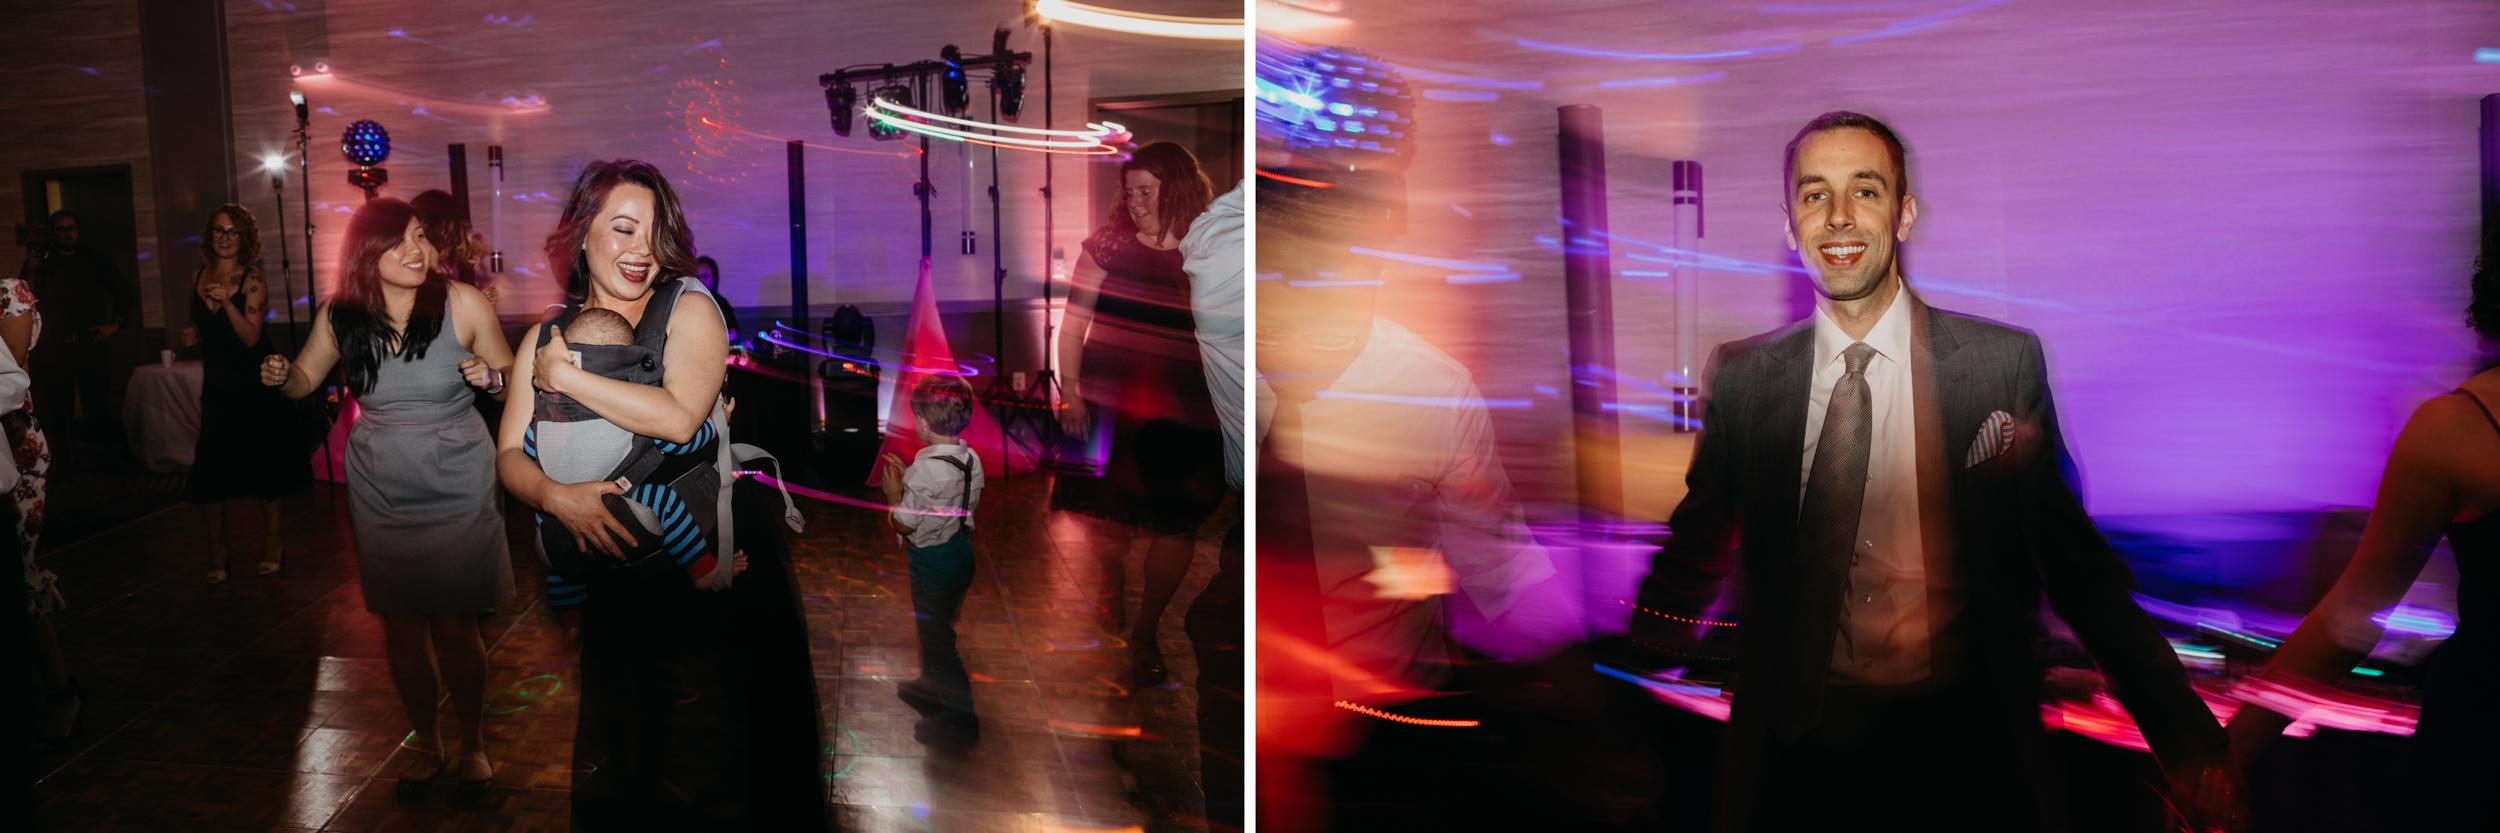 Mindy_Bo_Boston_Wedding_MIT_HotelCommonwealth_034.jpg